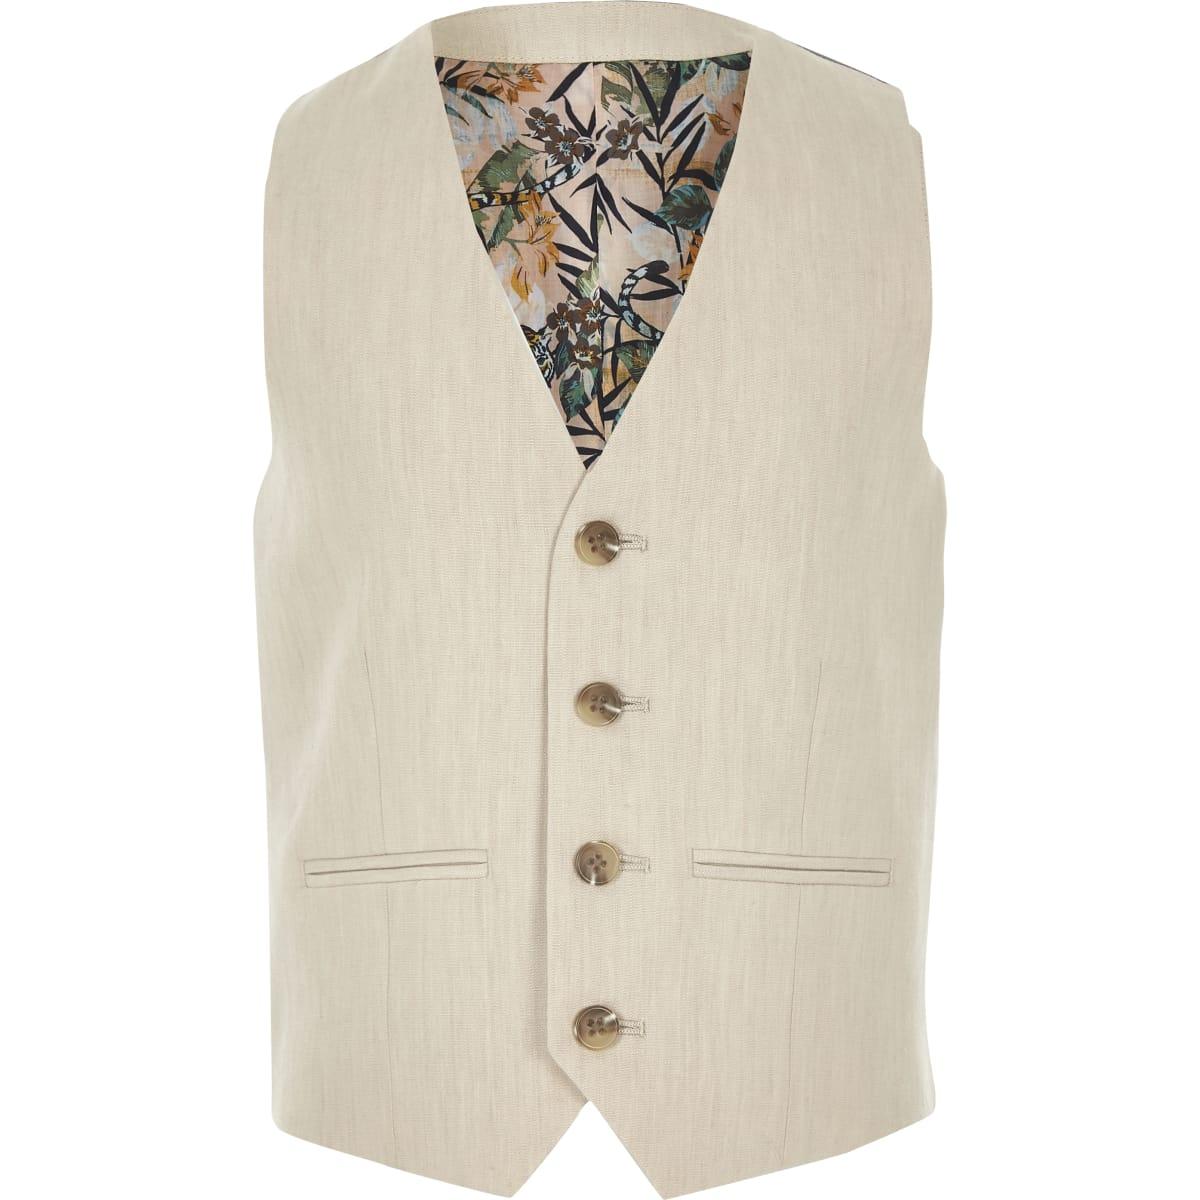 Boys cream linen suit waistcoat